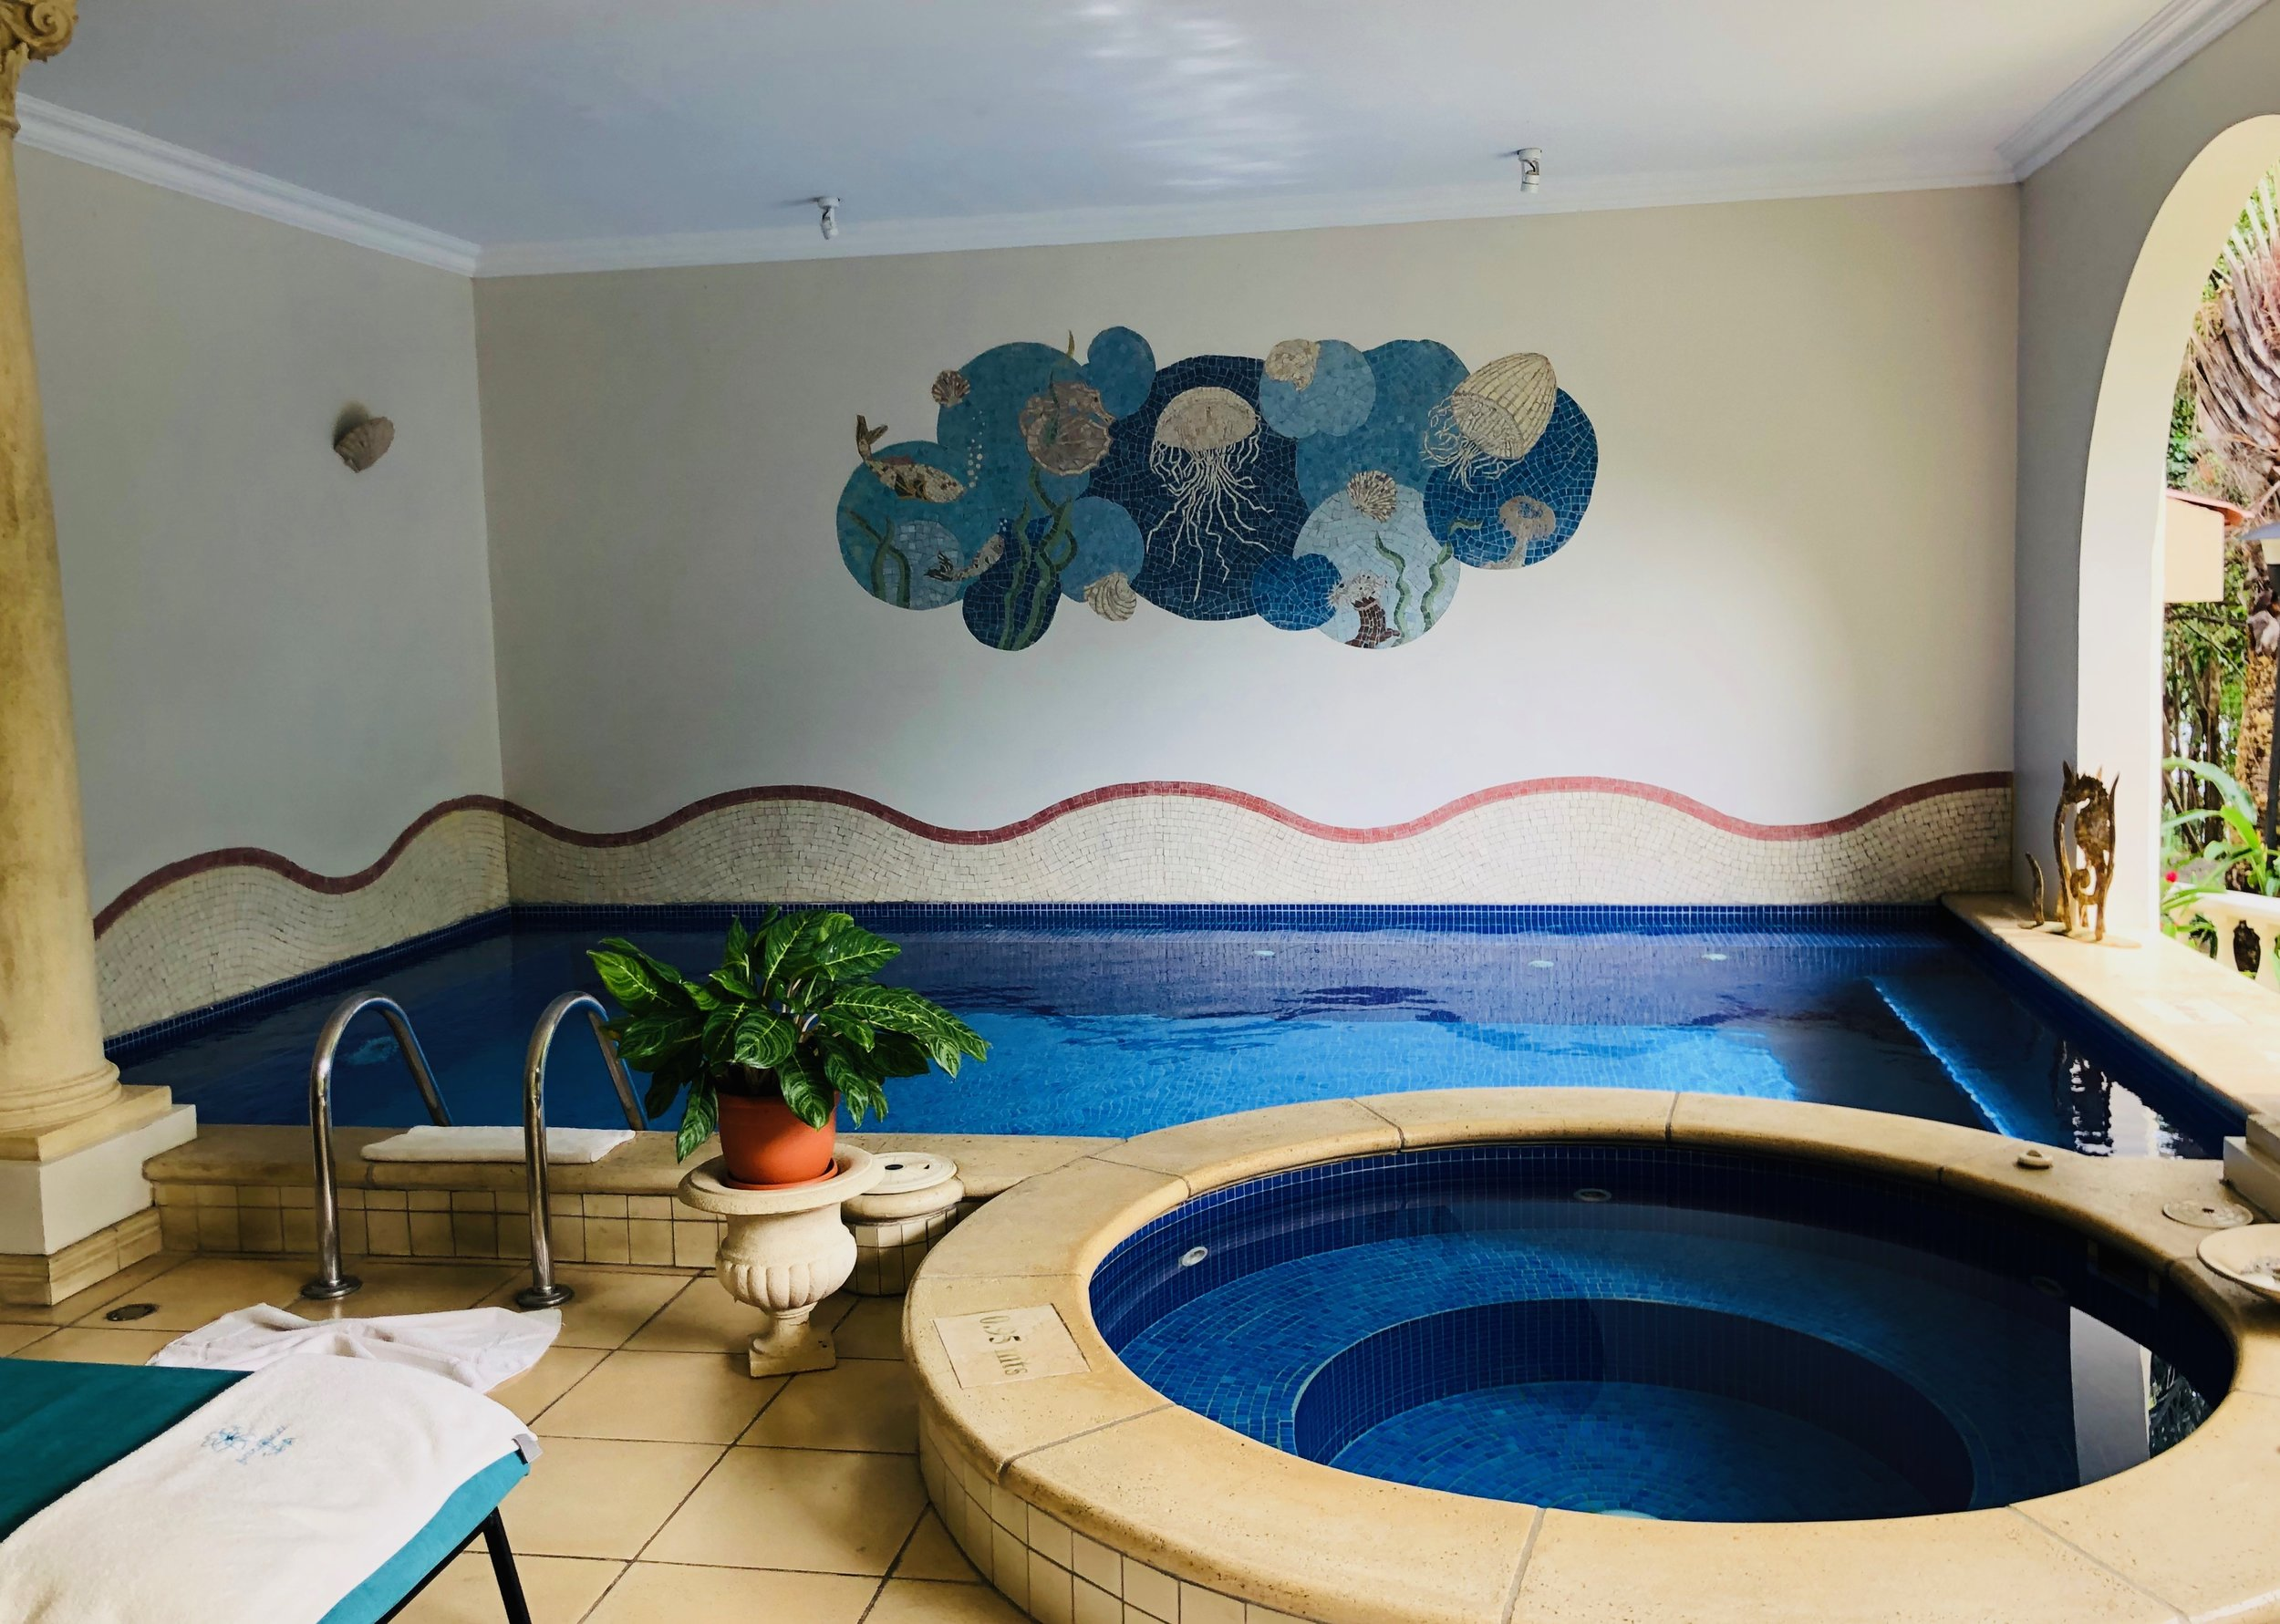 Spa Parador Resort